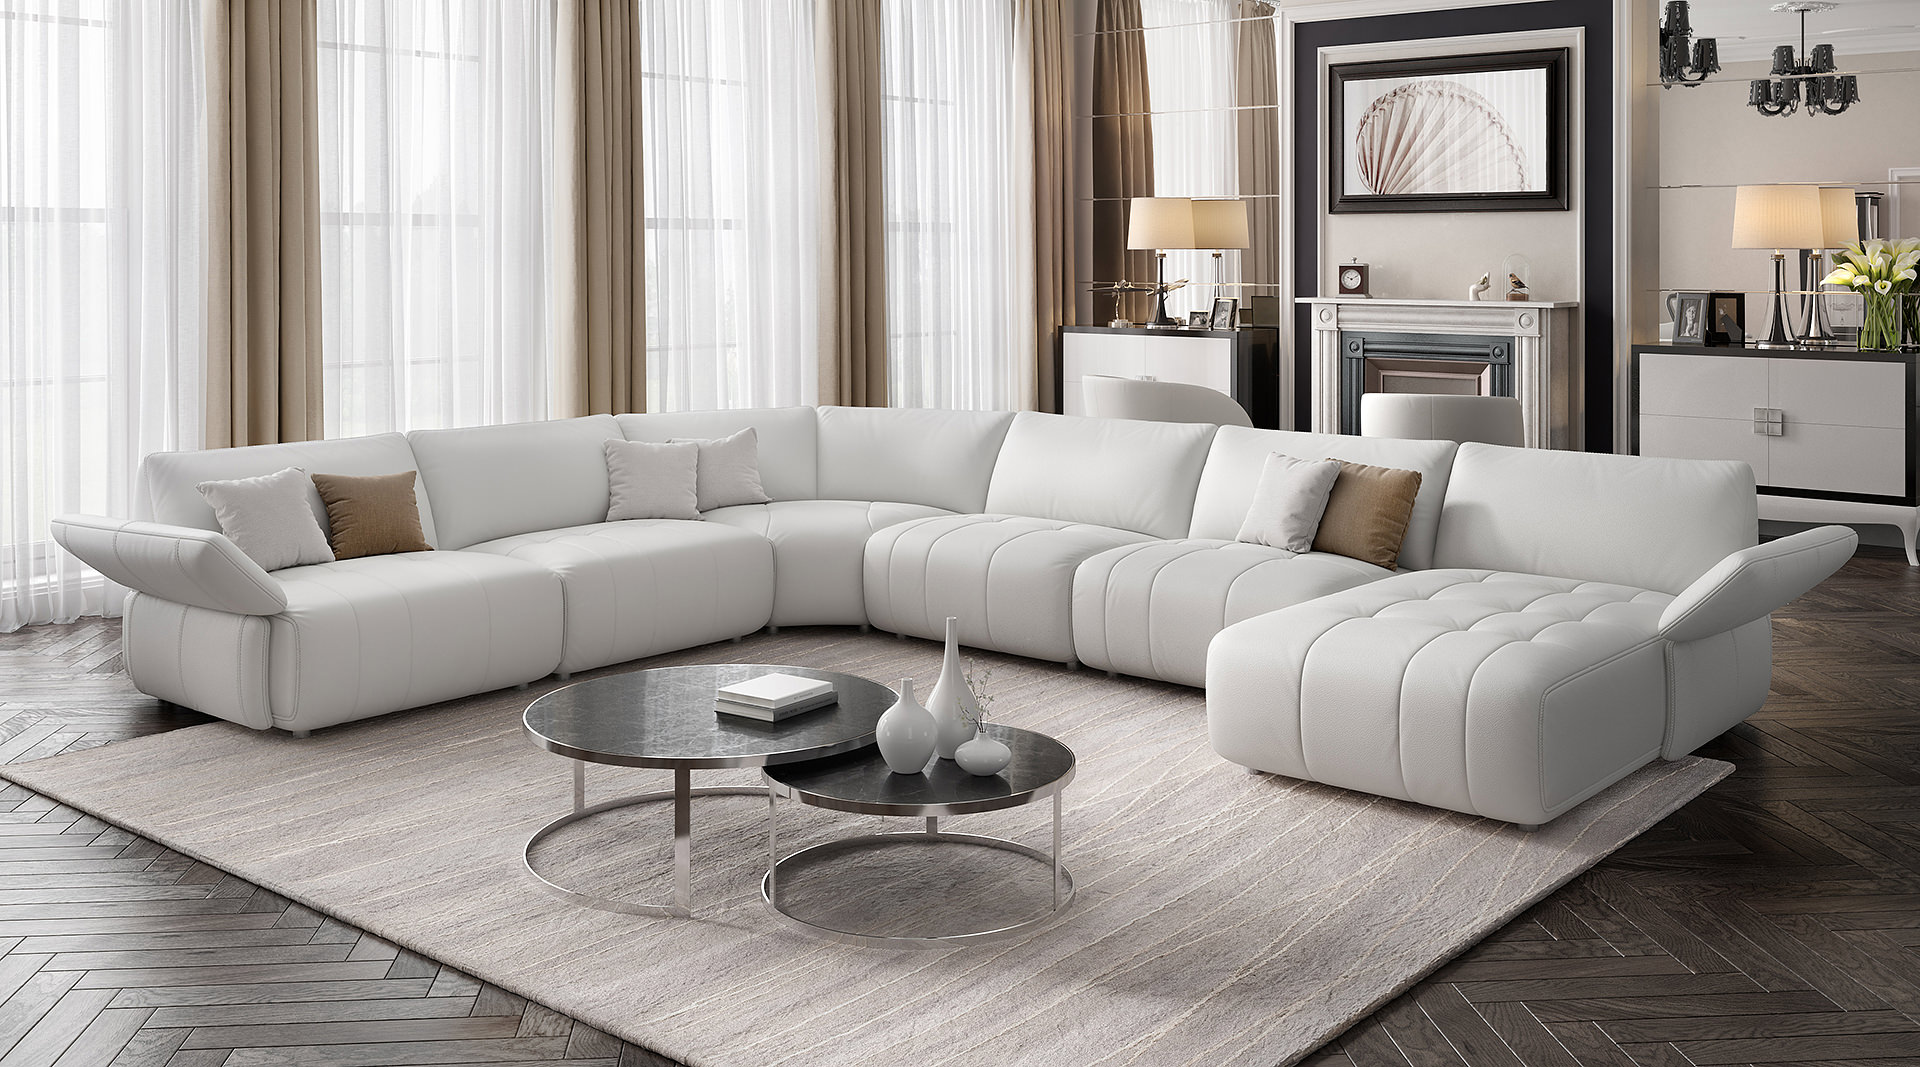 Sofa u form 3m m bel ideen und home design inspiration for Couch u form 3m